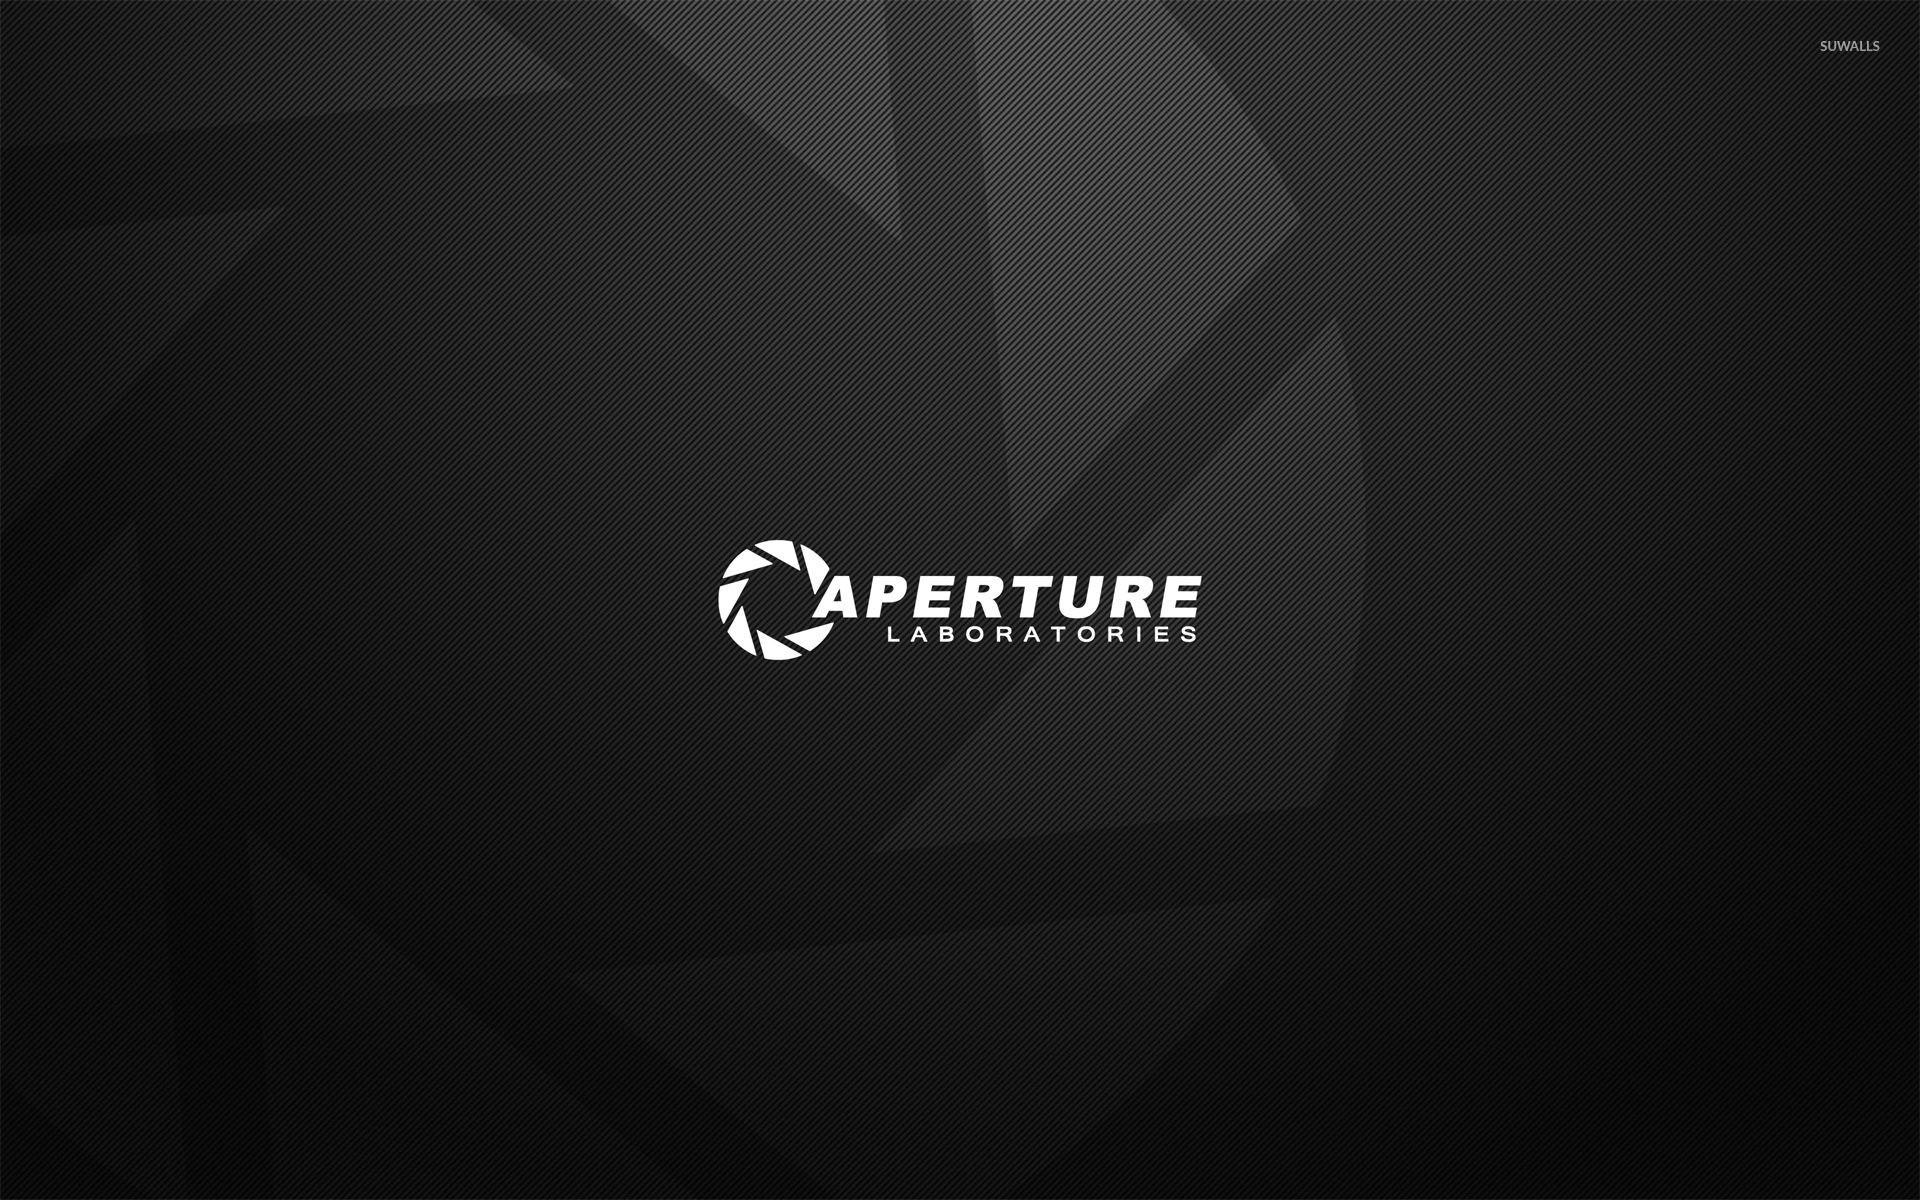 Aperture Laboratories logo wallpaper jpg